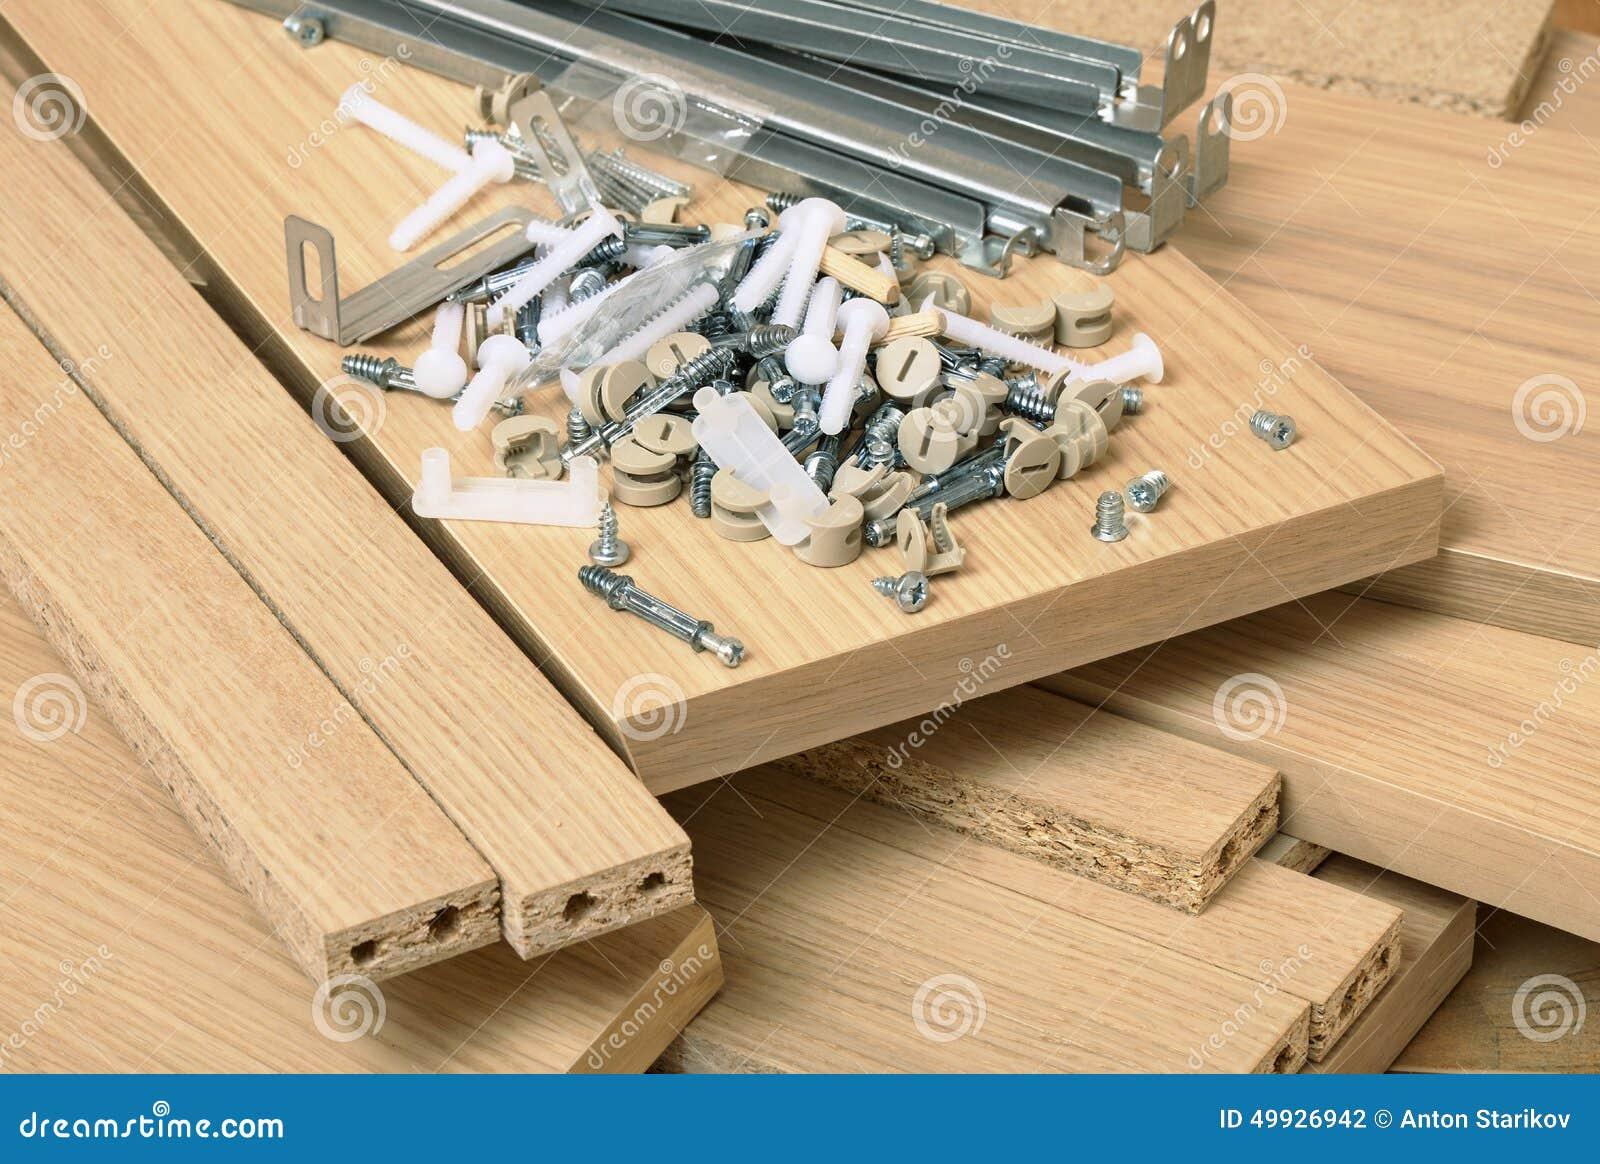 Assembling furniture